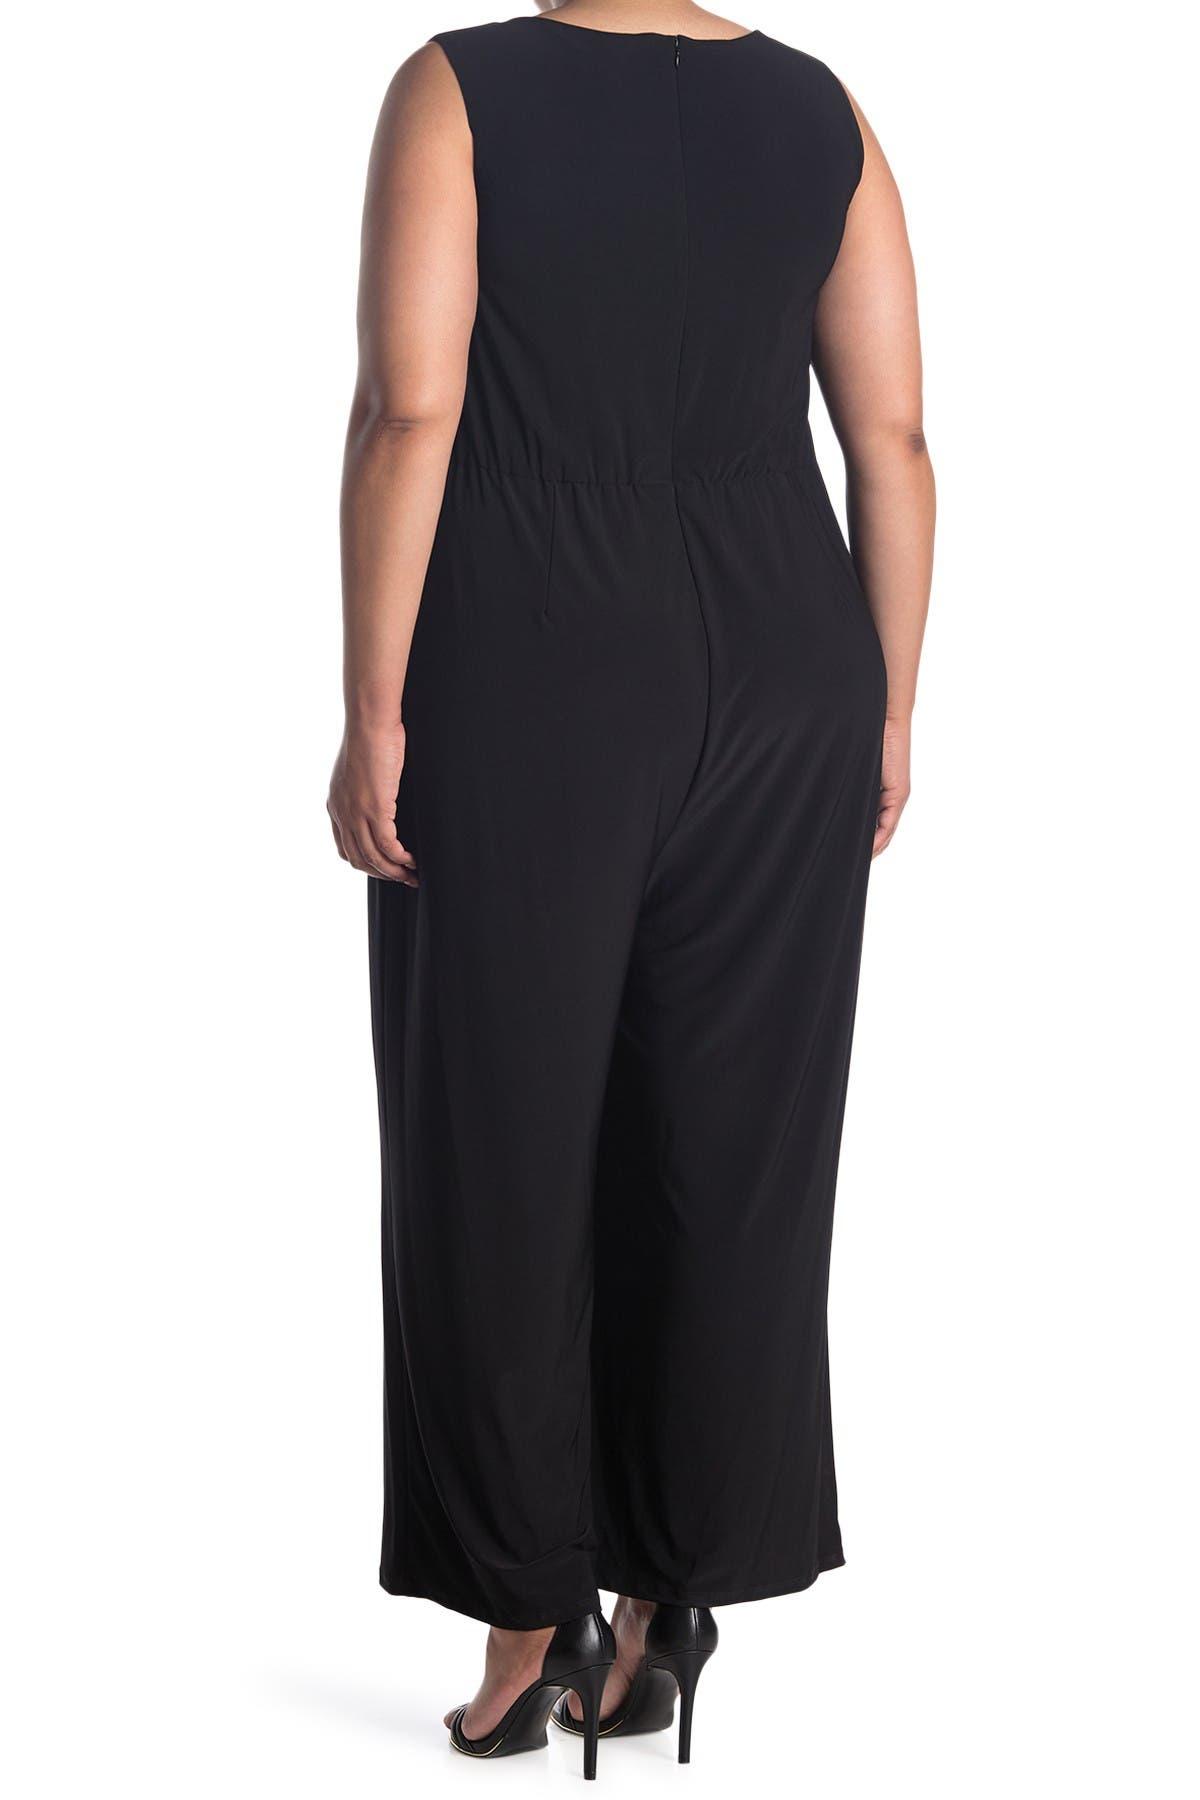 Image of Donna Ricco Criss Cross Waist Sleeveless Jumpsuit